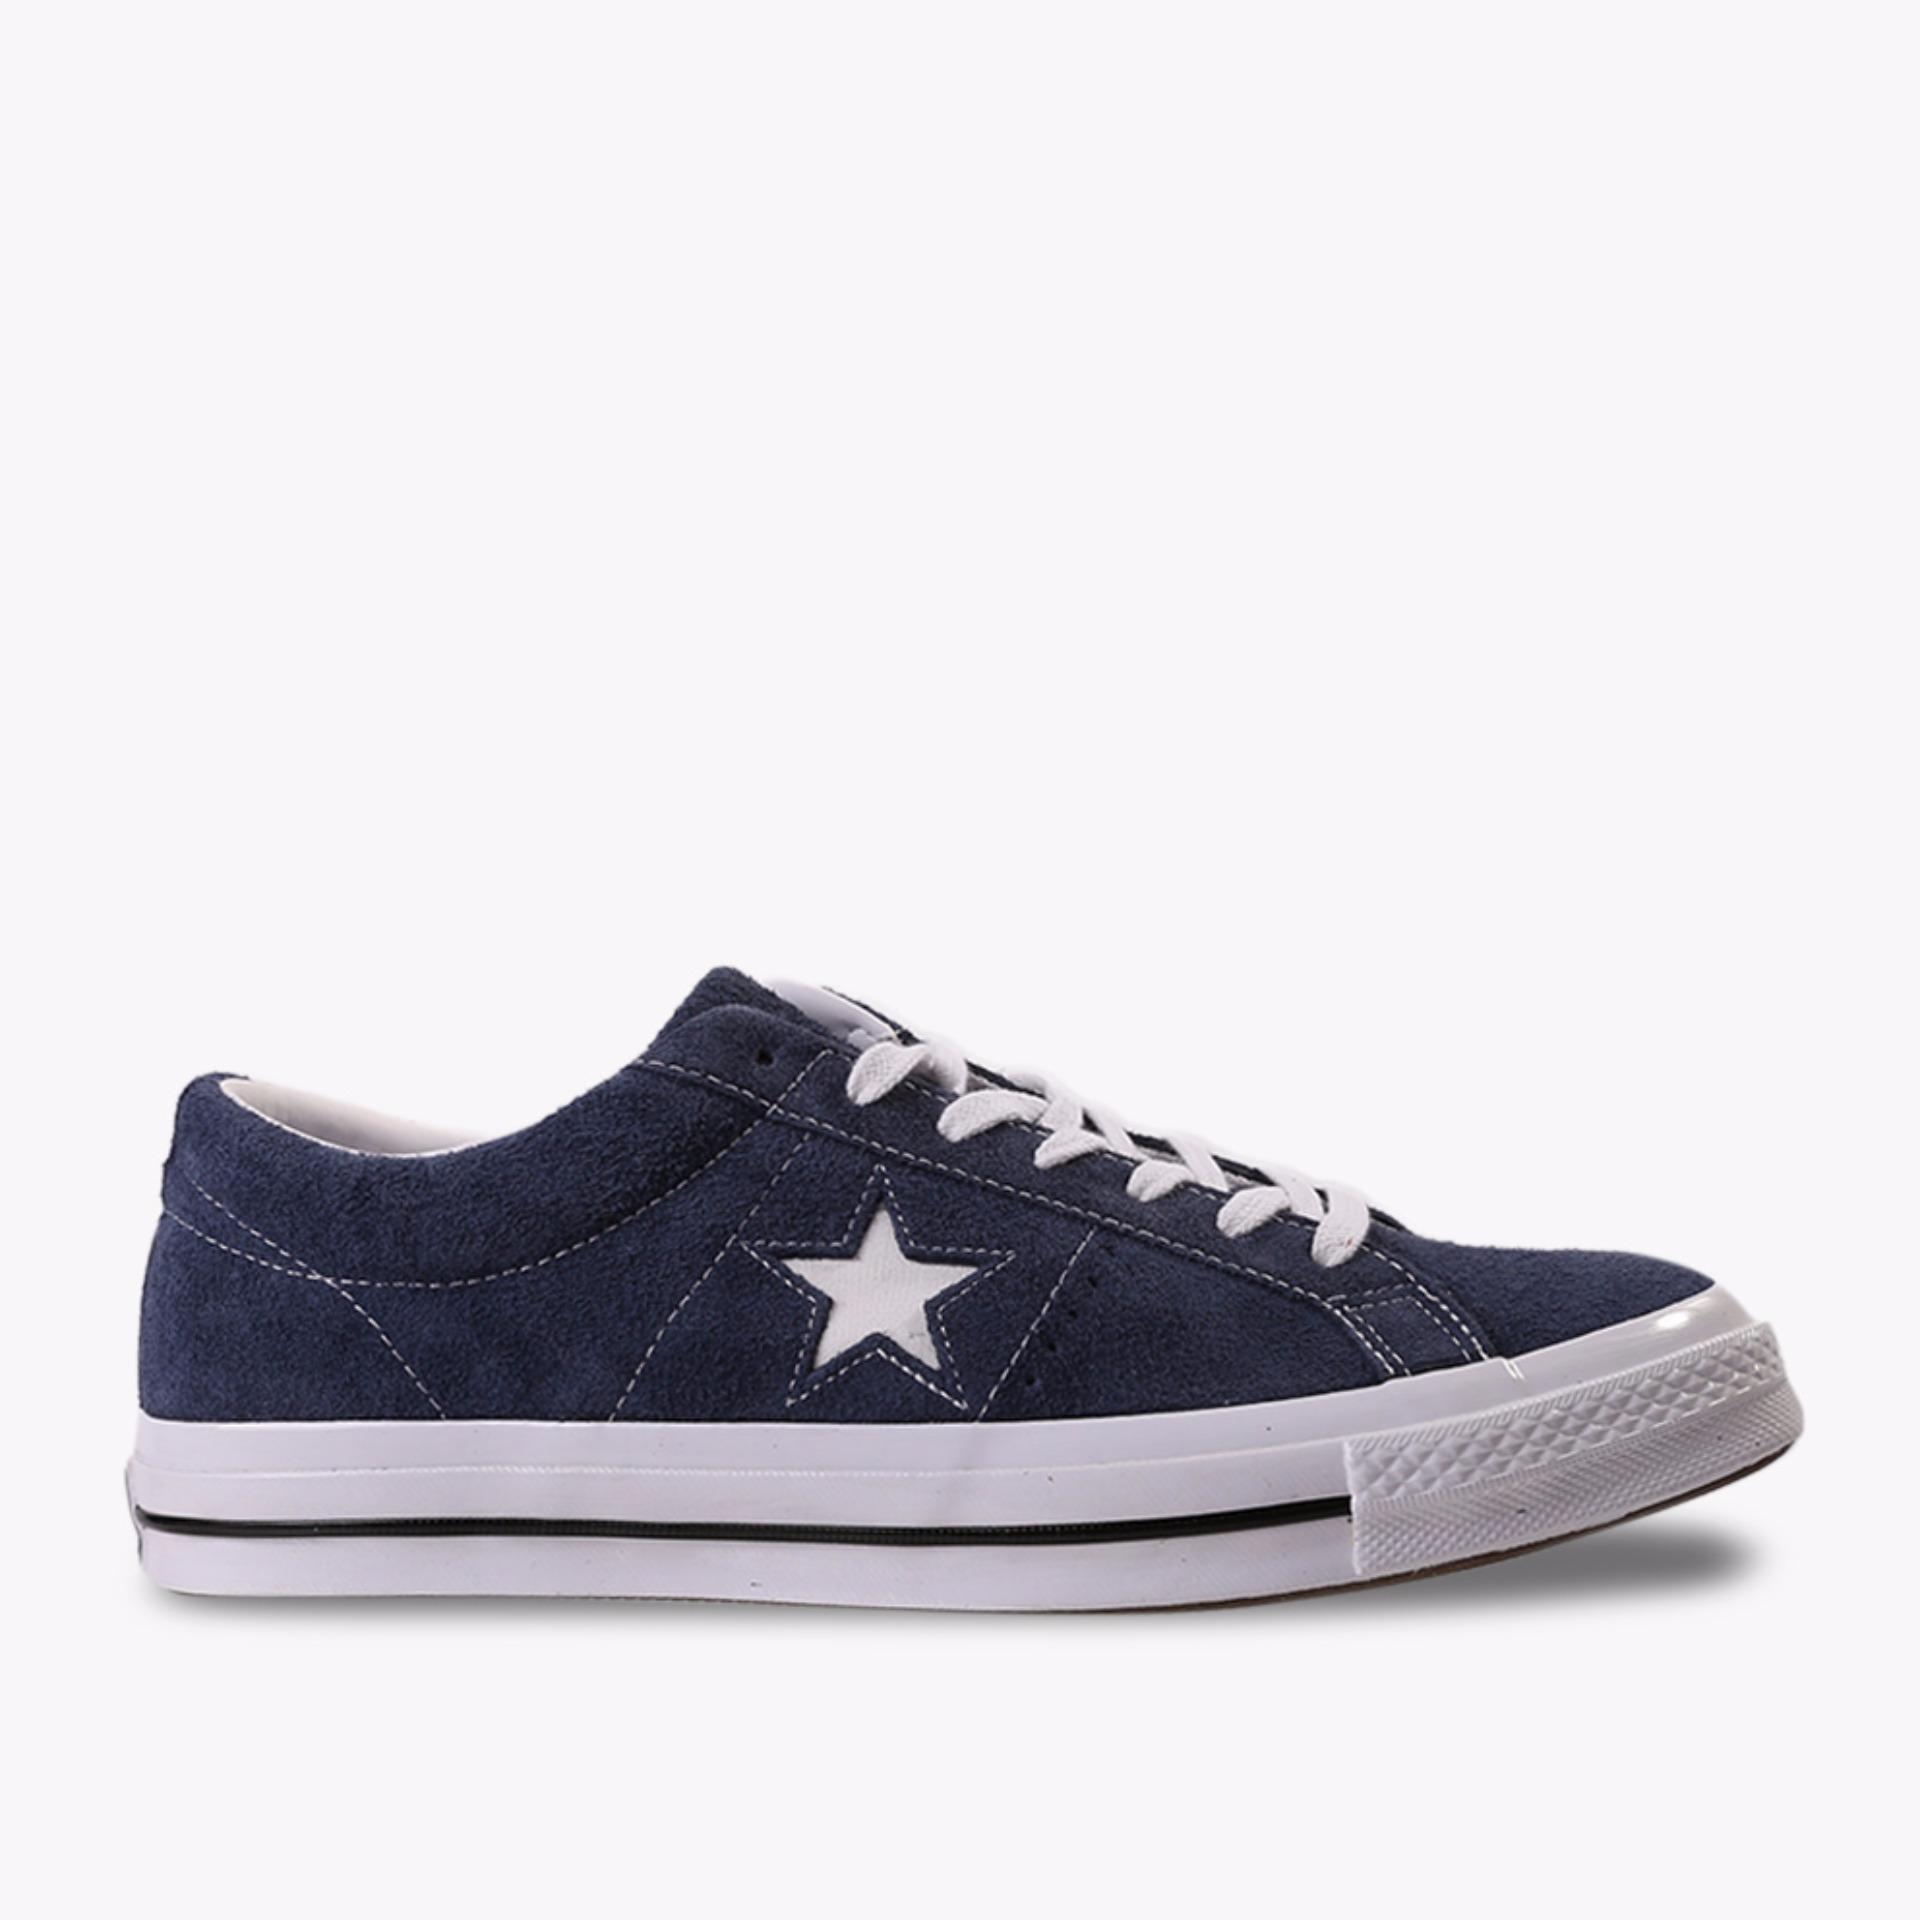 Harga Converse One Star Premium Suede Low Men S Sneakers Shoes Biru Tua Merk Converse